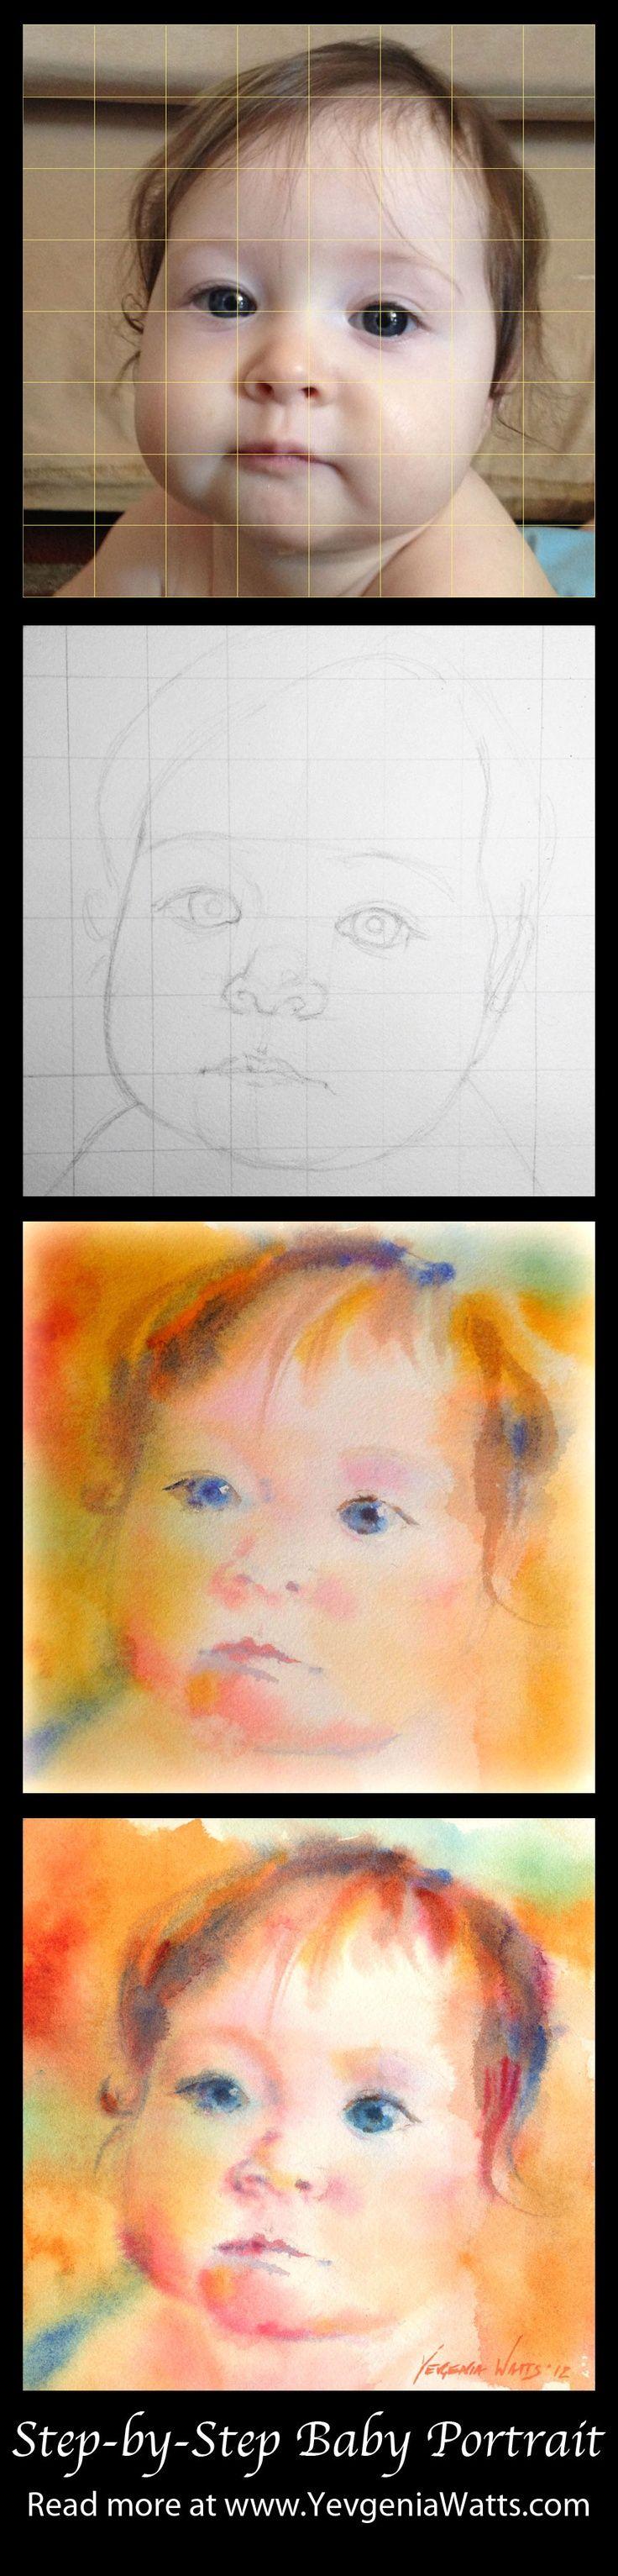 Wetintowet Watercolor Portrait Study Step By Step